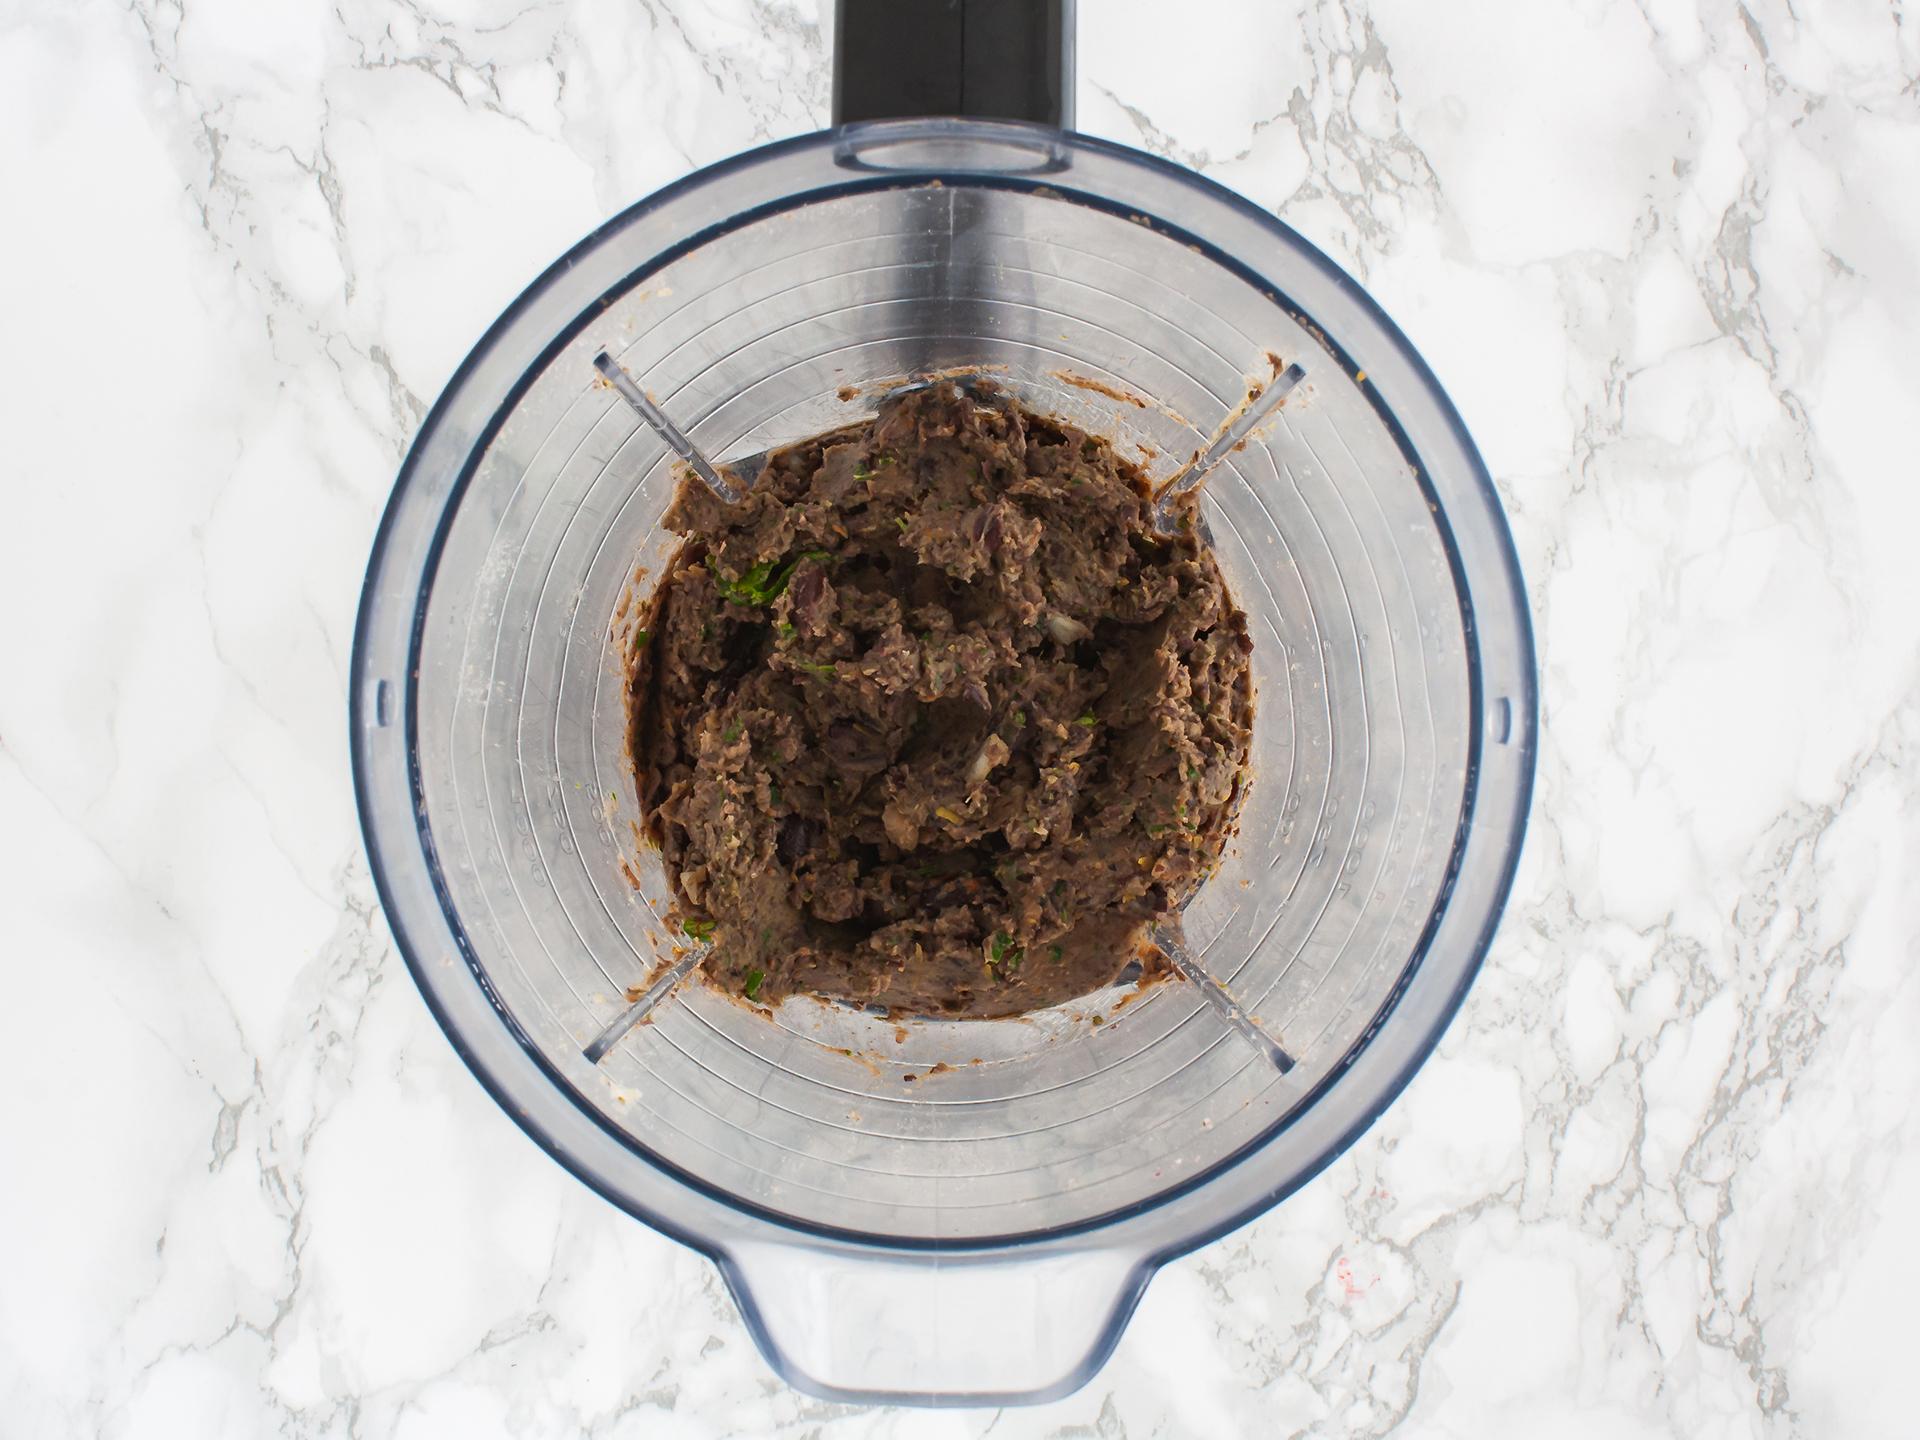 Step 3.2 of Baked Black Bean and Sweet Potato Falafels